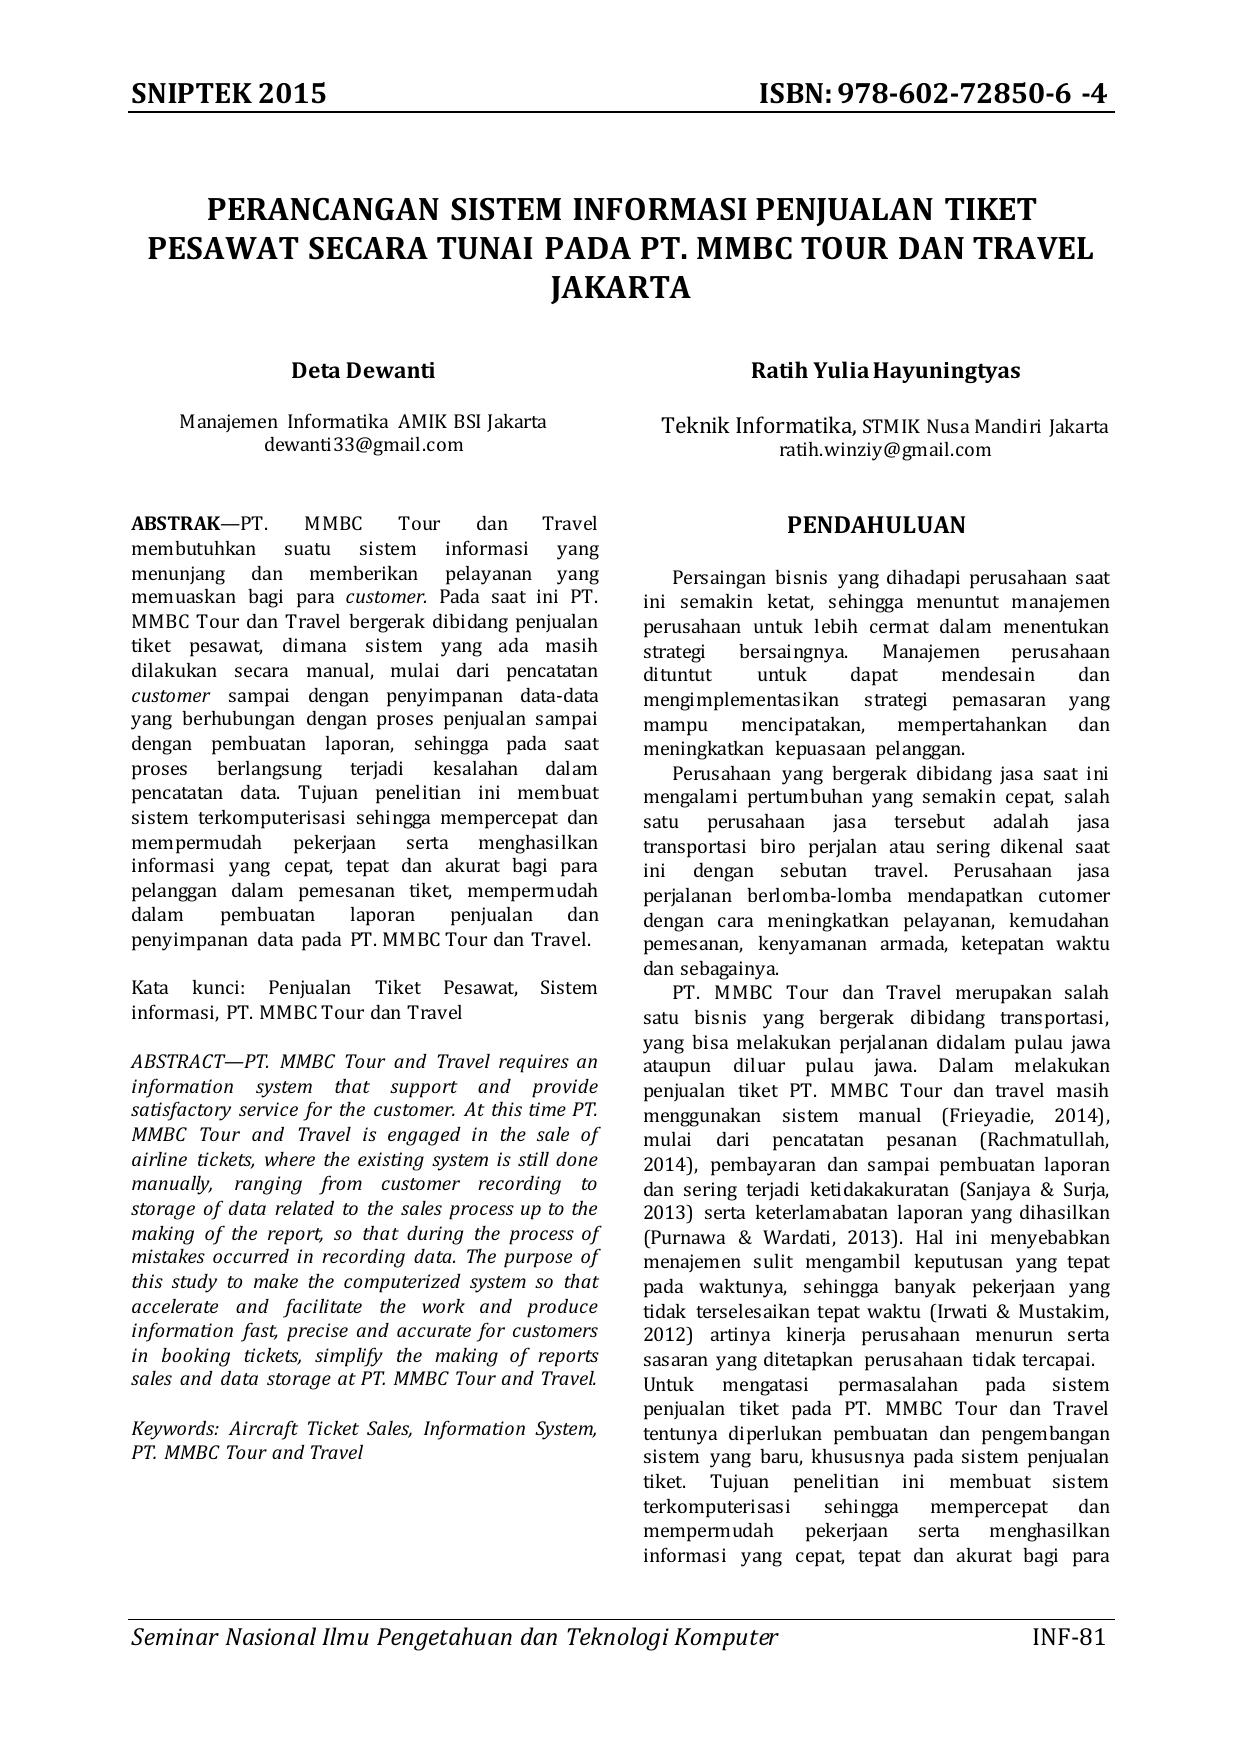 Perancangan sistem informasi penjualan tiket pesawat secara tunai ccuart Image collections